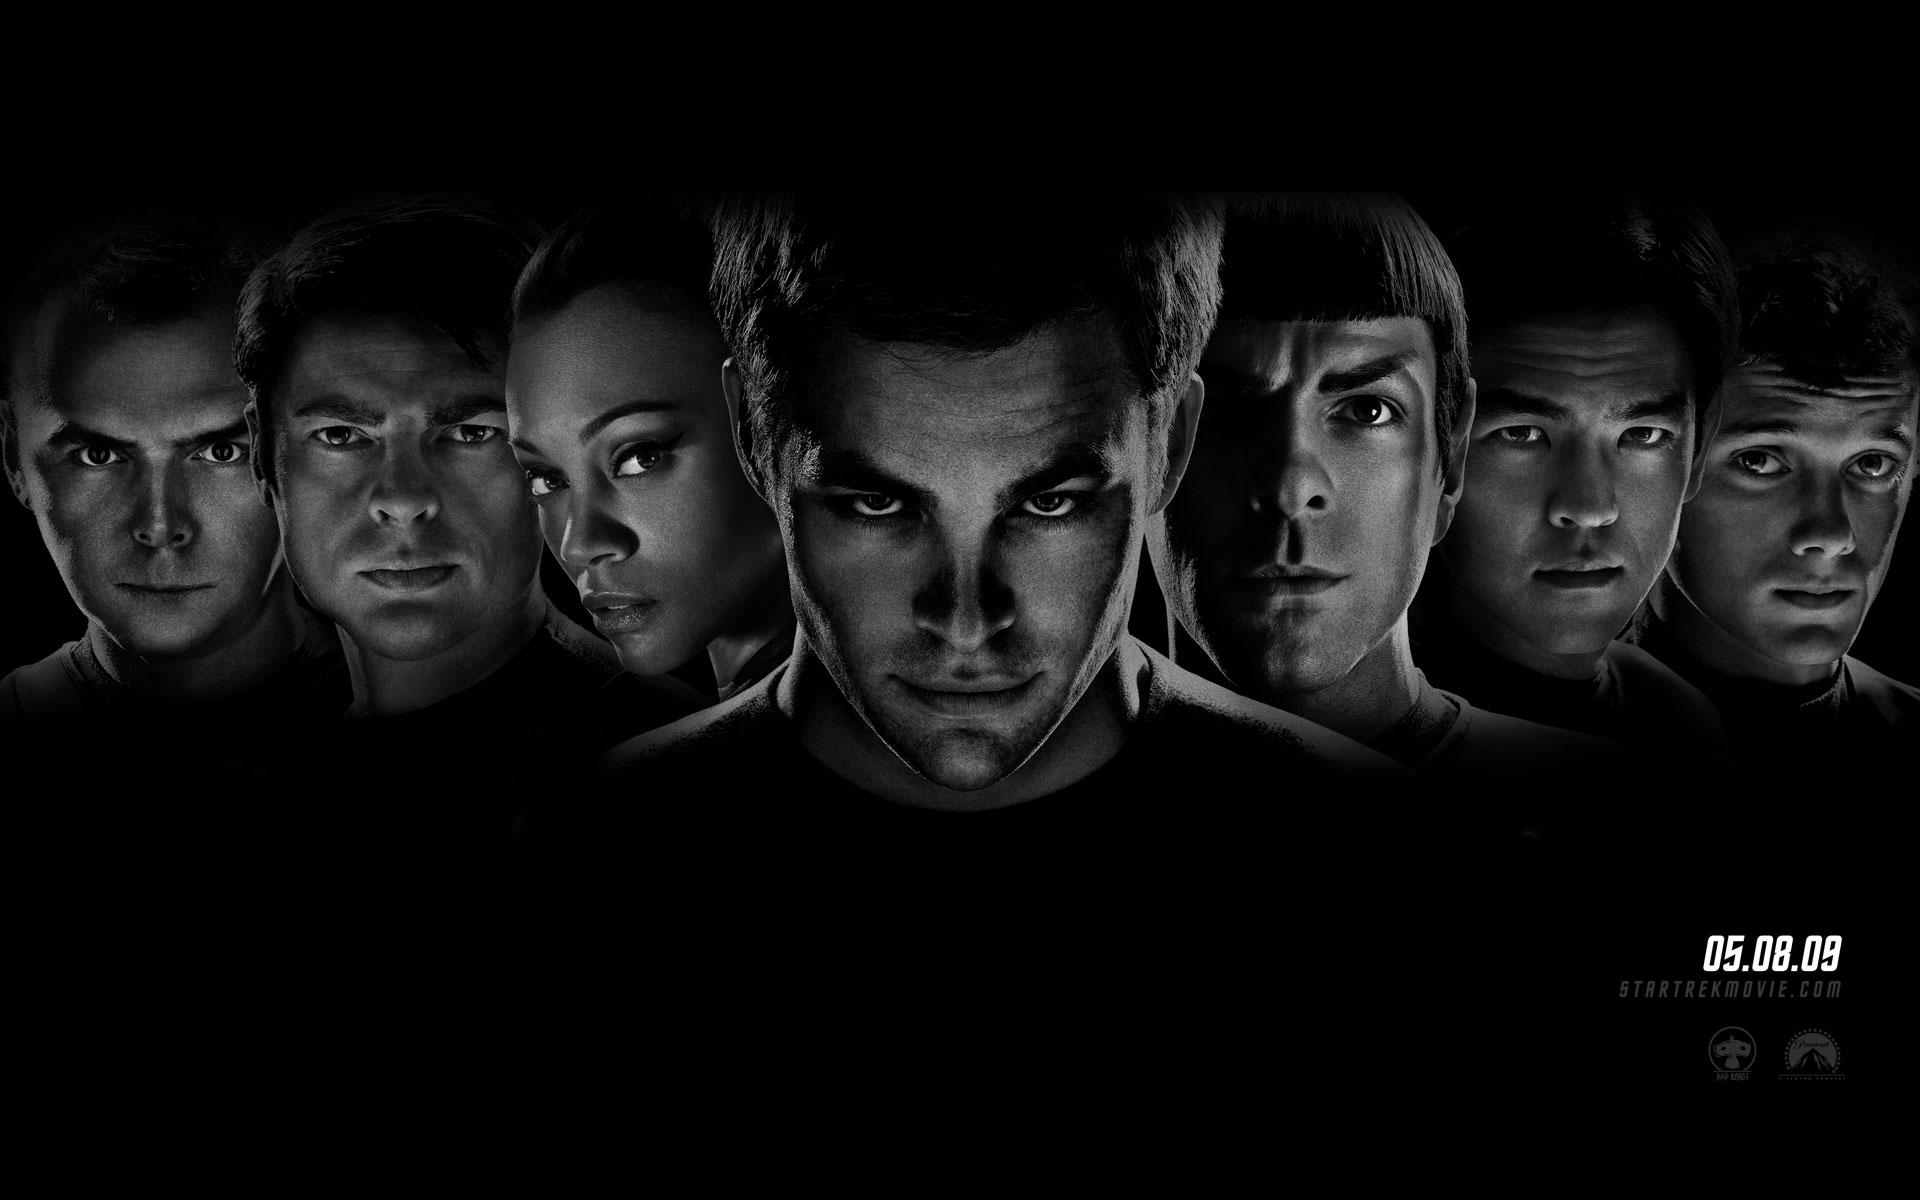 Star Trek 2009 wallpaper   333851 1920x1200